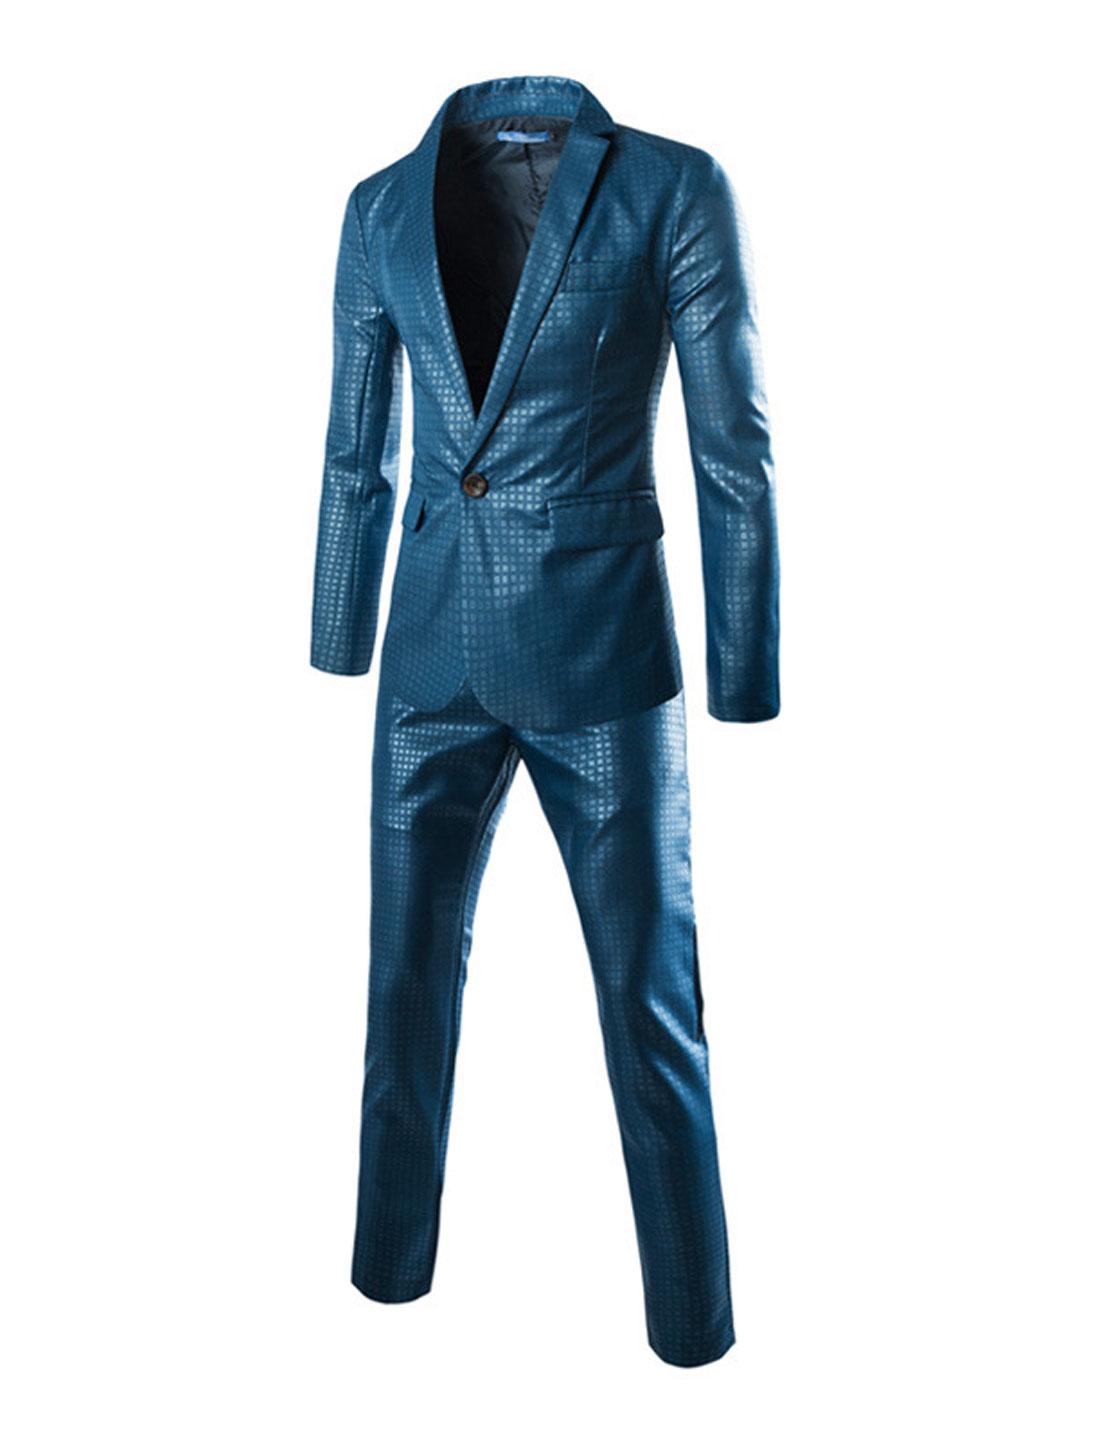 Men Plaids Pattern Padded Shoulders Blazer w Slim Fit Pants Sets Blue S